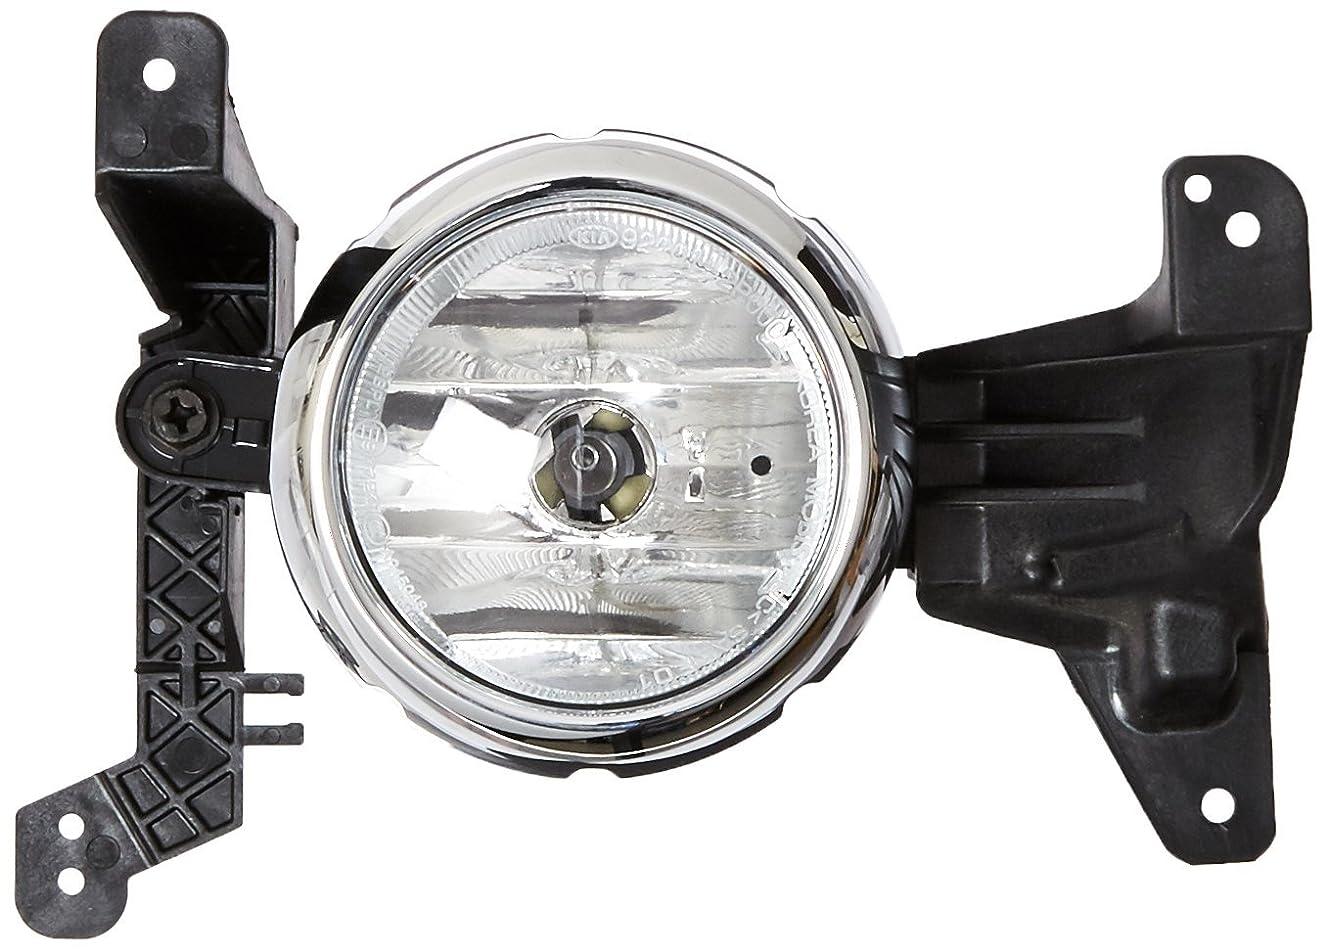 Genuine Kia (92201-1U000) Fog Lamp Assembly, Front, Left